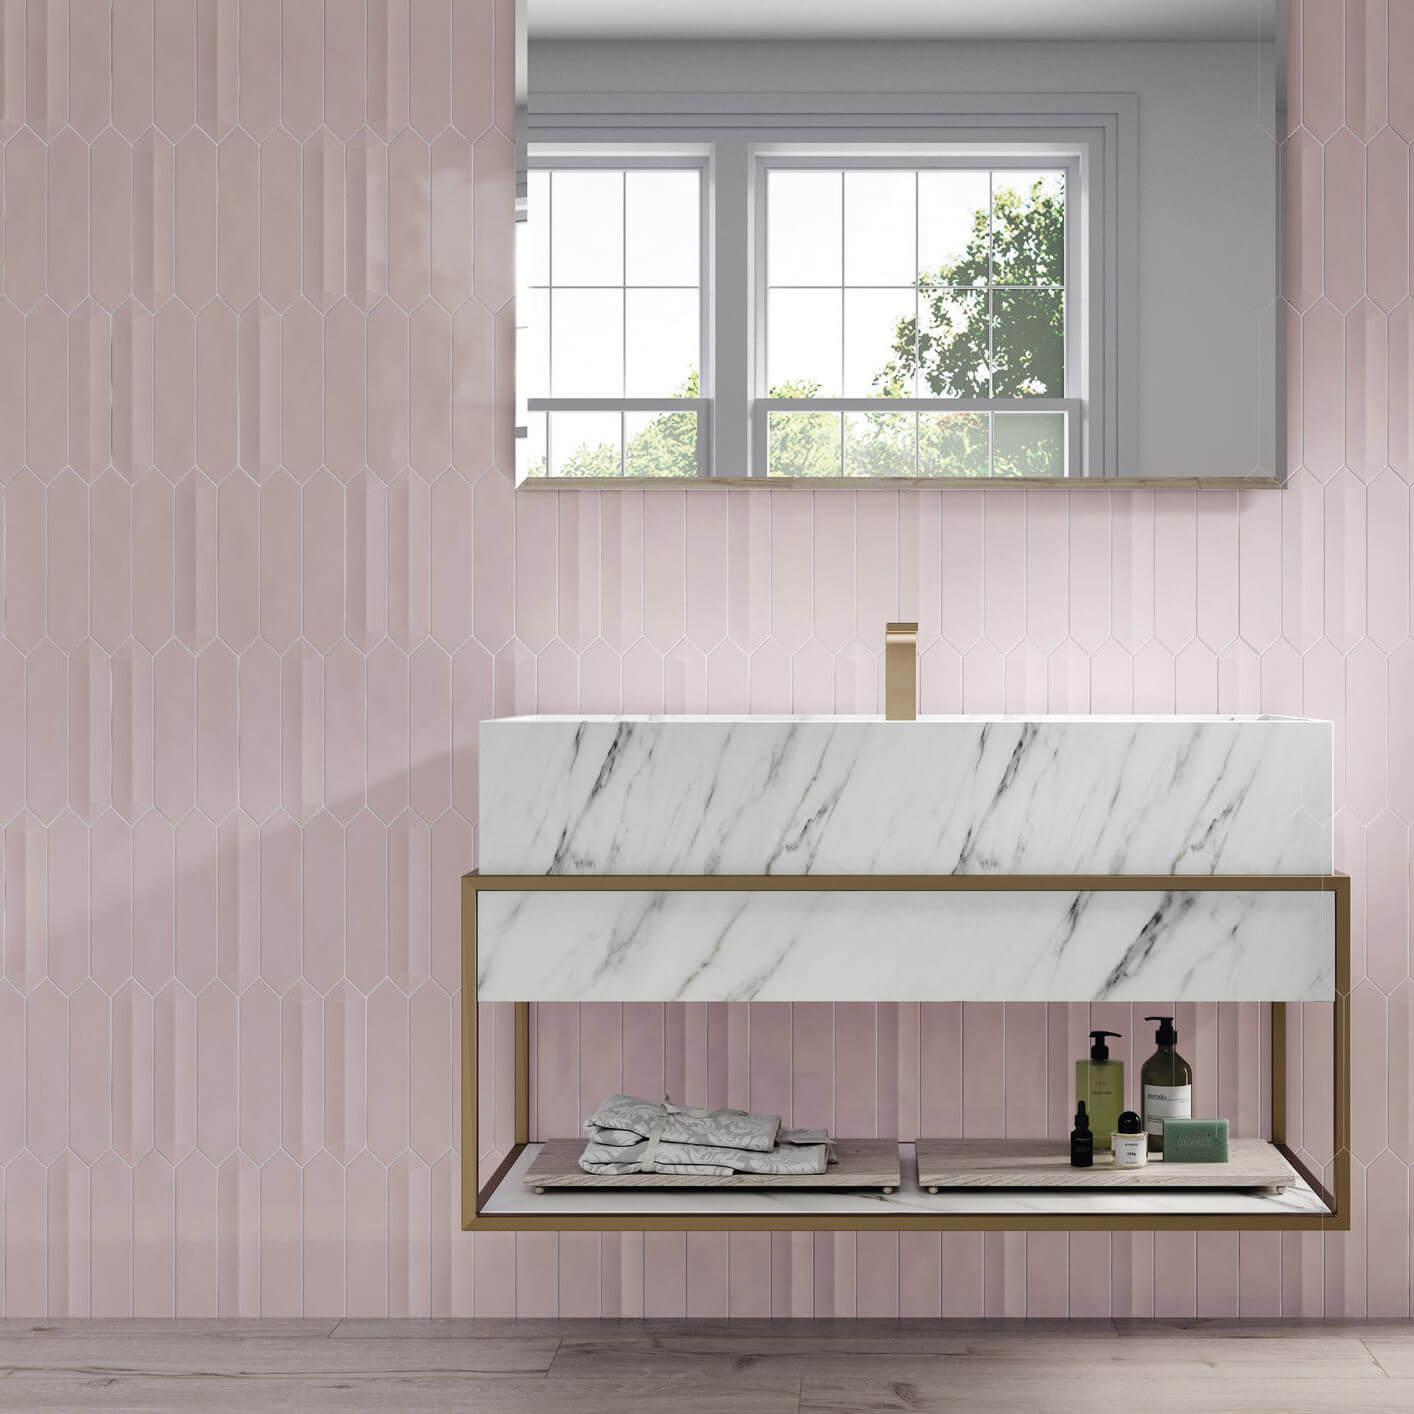 Carrelage aspect zellige Dimsey pink outside 6,5x33,2 cm